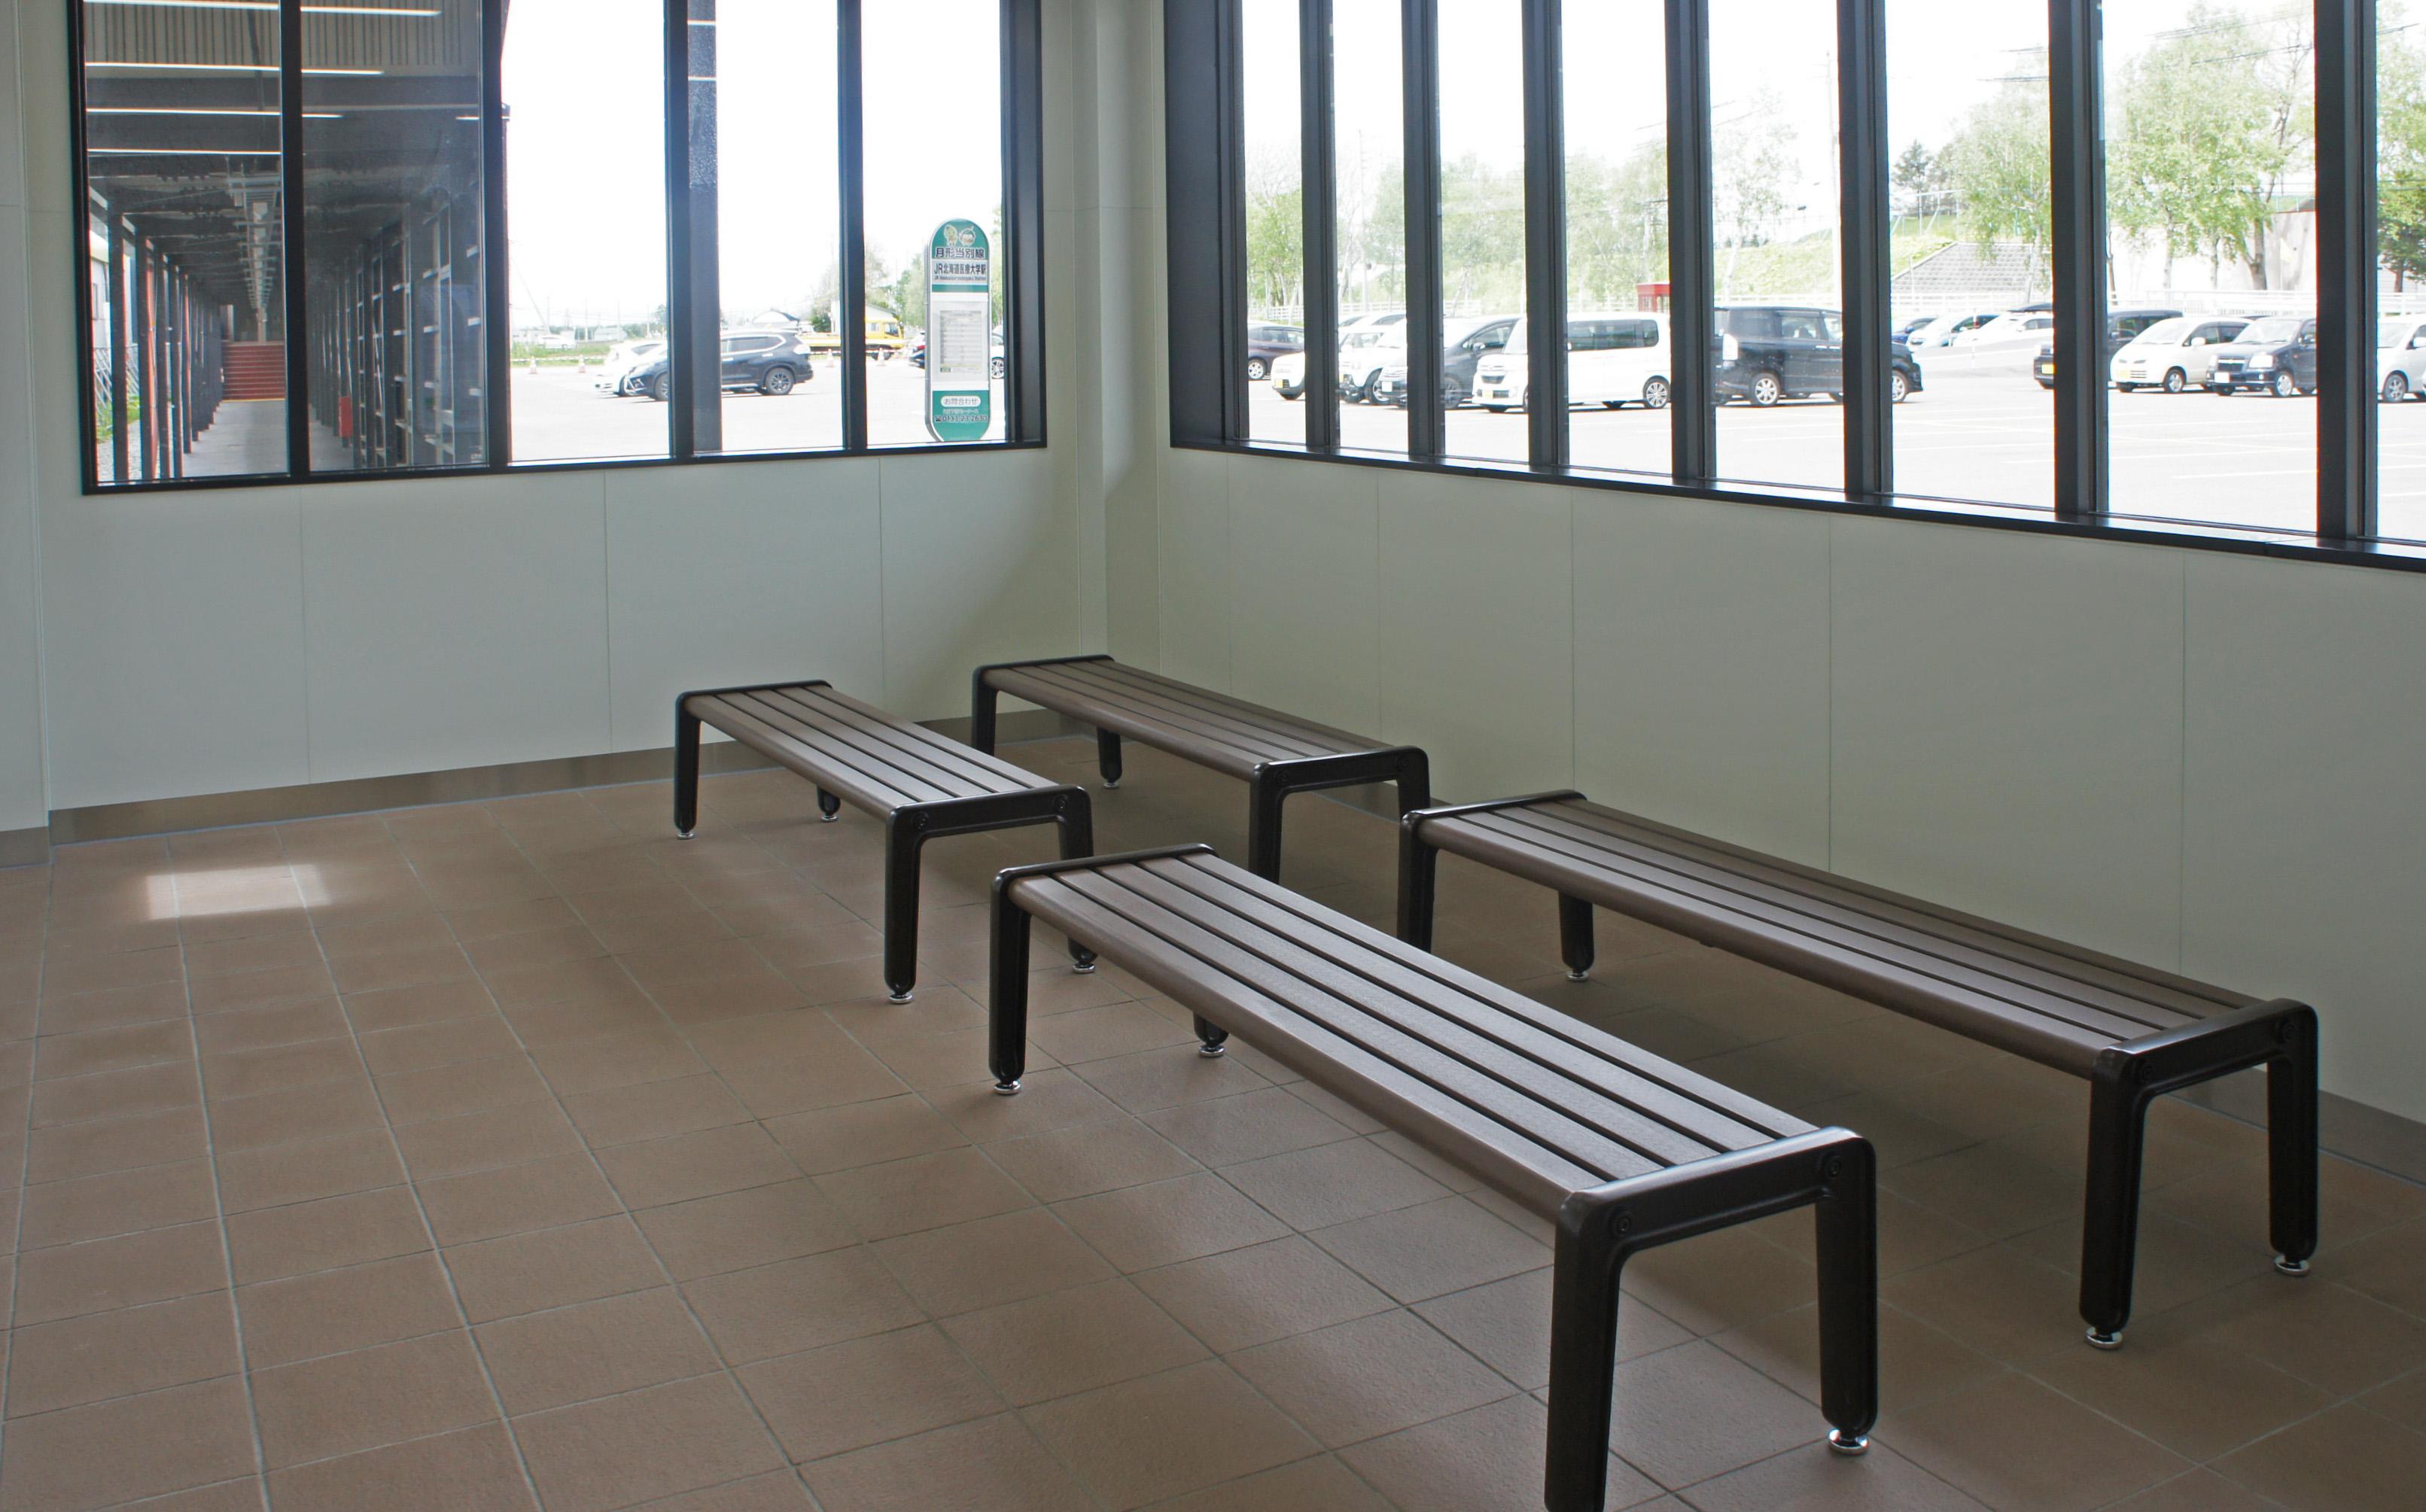 File:JR Sassho-Line Hokkaido-Iryodaigaku Station East Exit Waiting room.jpg  - Wikimedia Commons